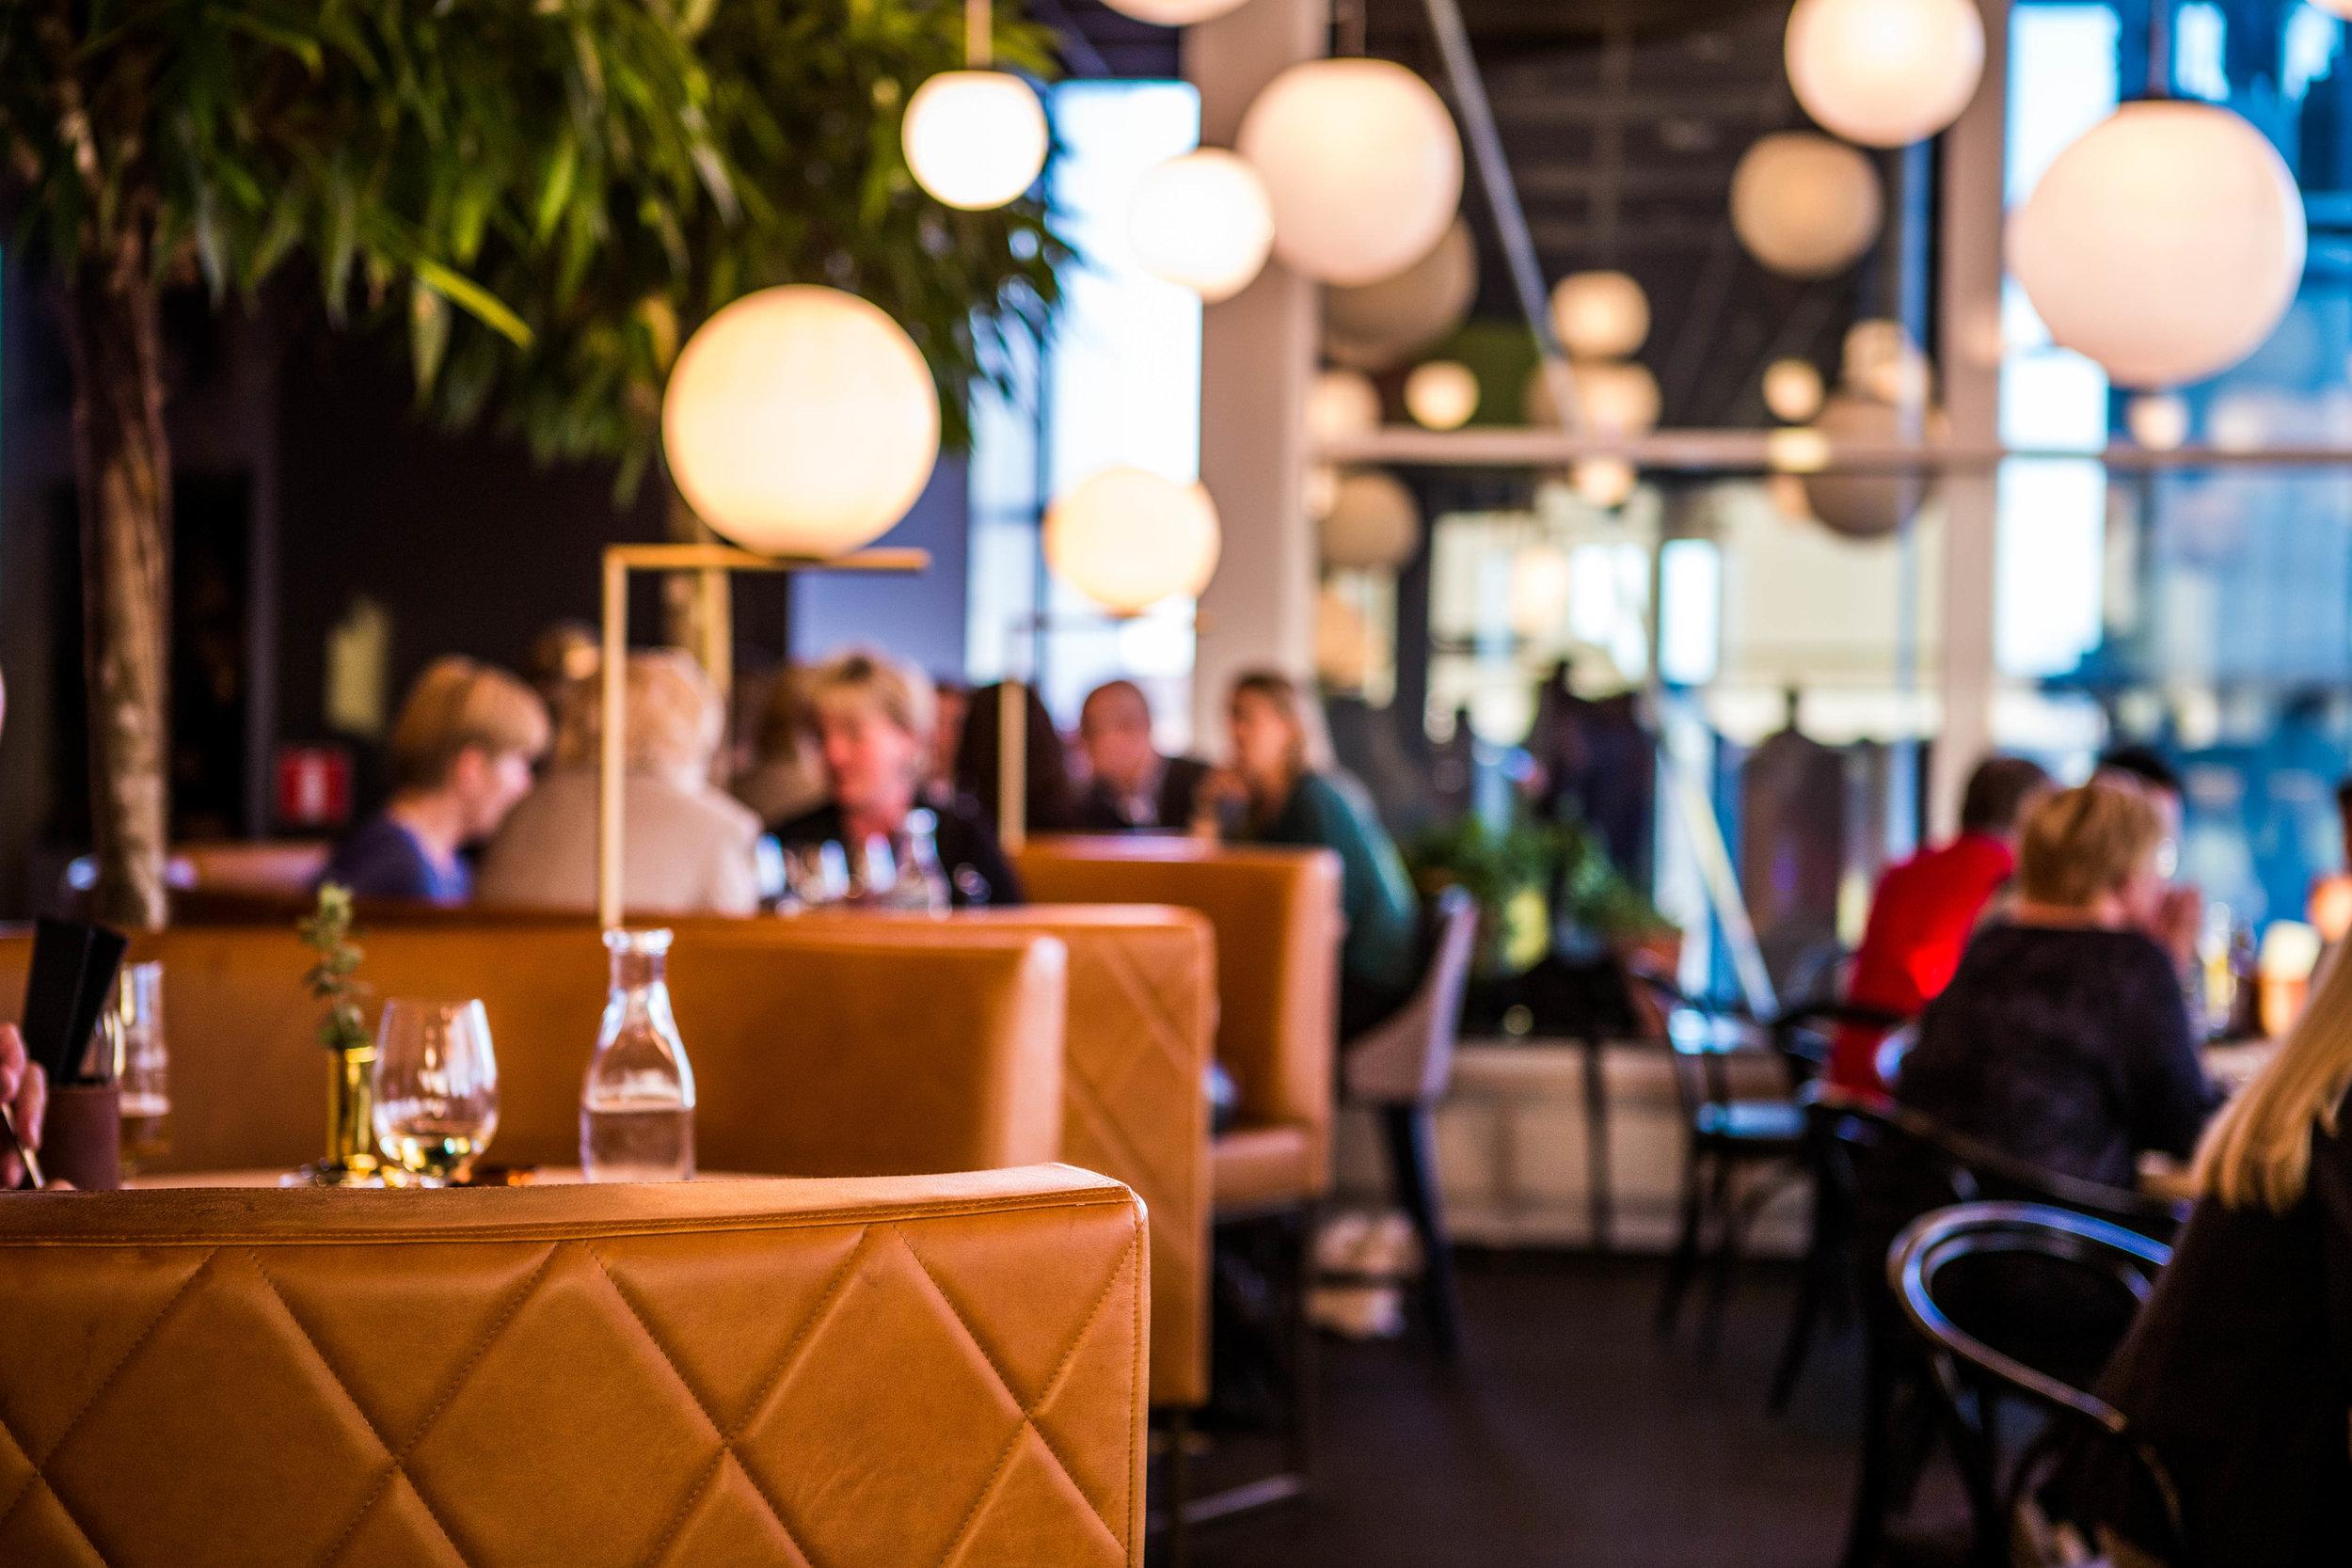 Sofa-restaurant-Heaven23-Gothenburg-Sweden-Facctory-photographer-Julio-Chang.jpg